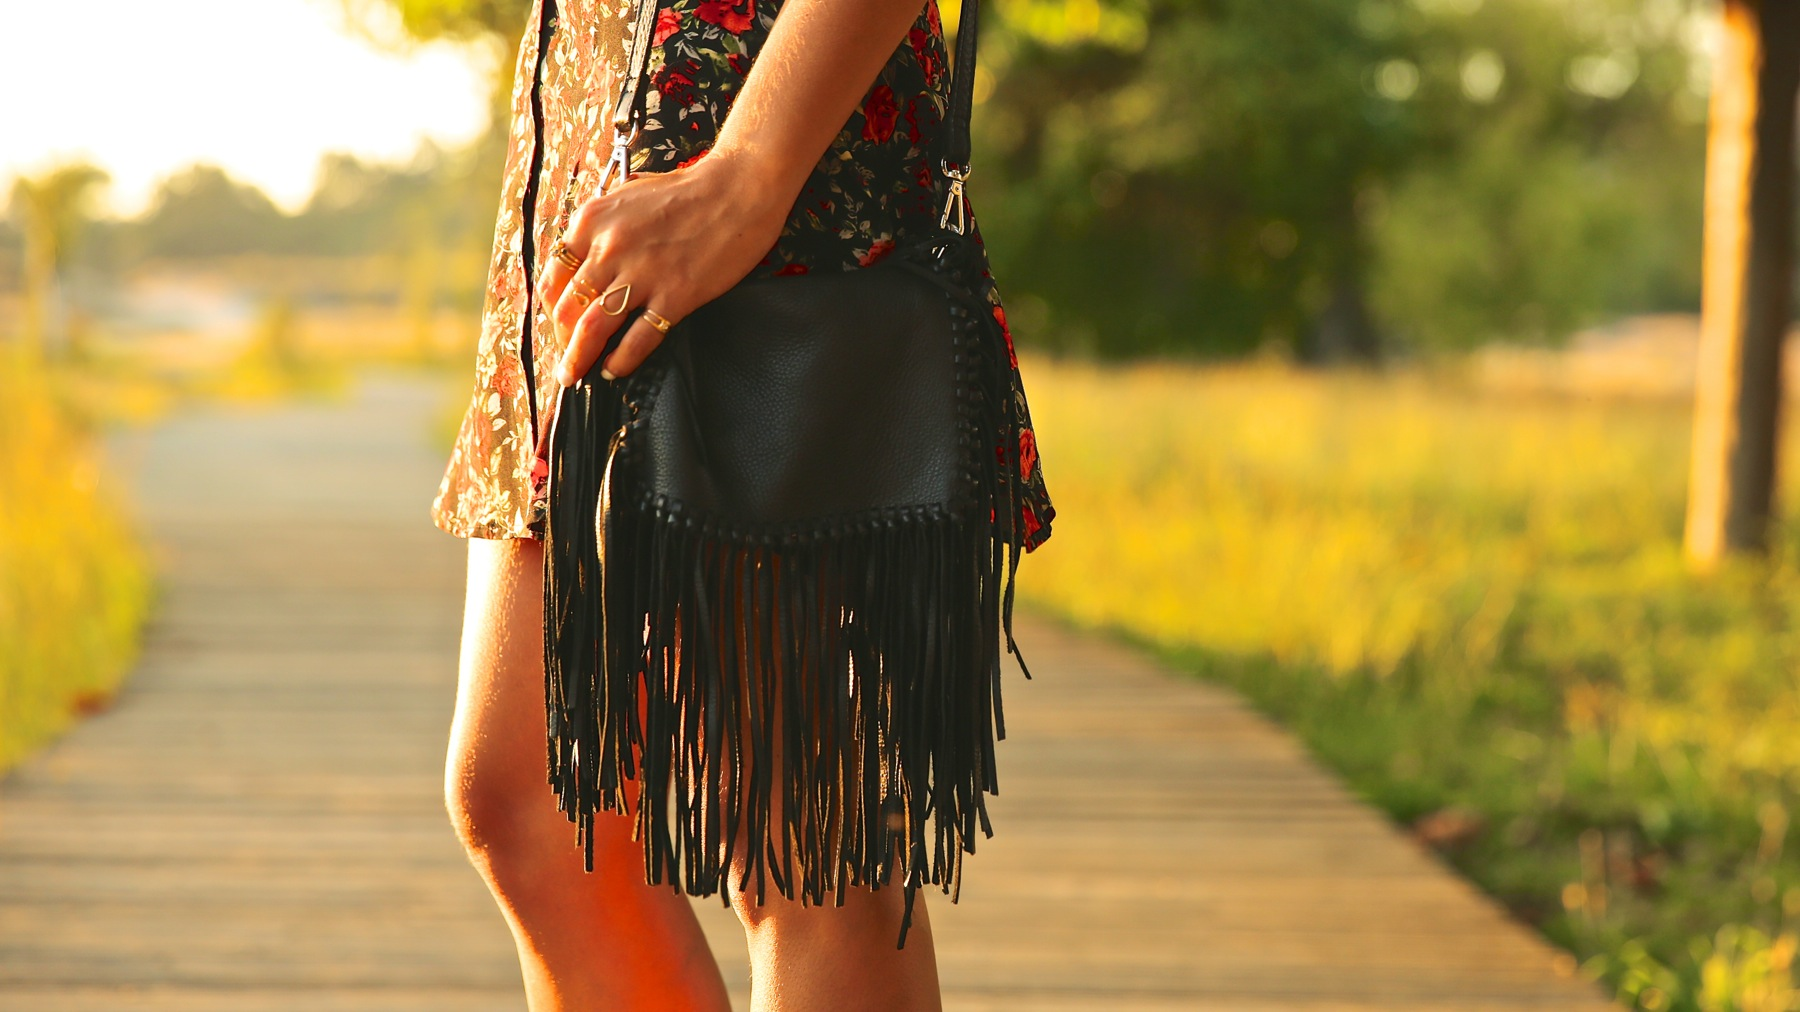 trendy_taste-look-outfit-street_style-ootd-blog-blogger-fashion_spain-moda_españa-flower_print-dress-vestido-flores-sandalias_negras-black_sandals-platforms-sunset-playa-beach-summer-4